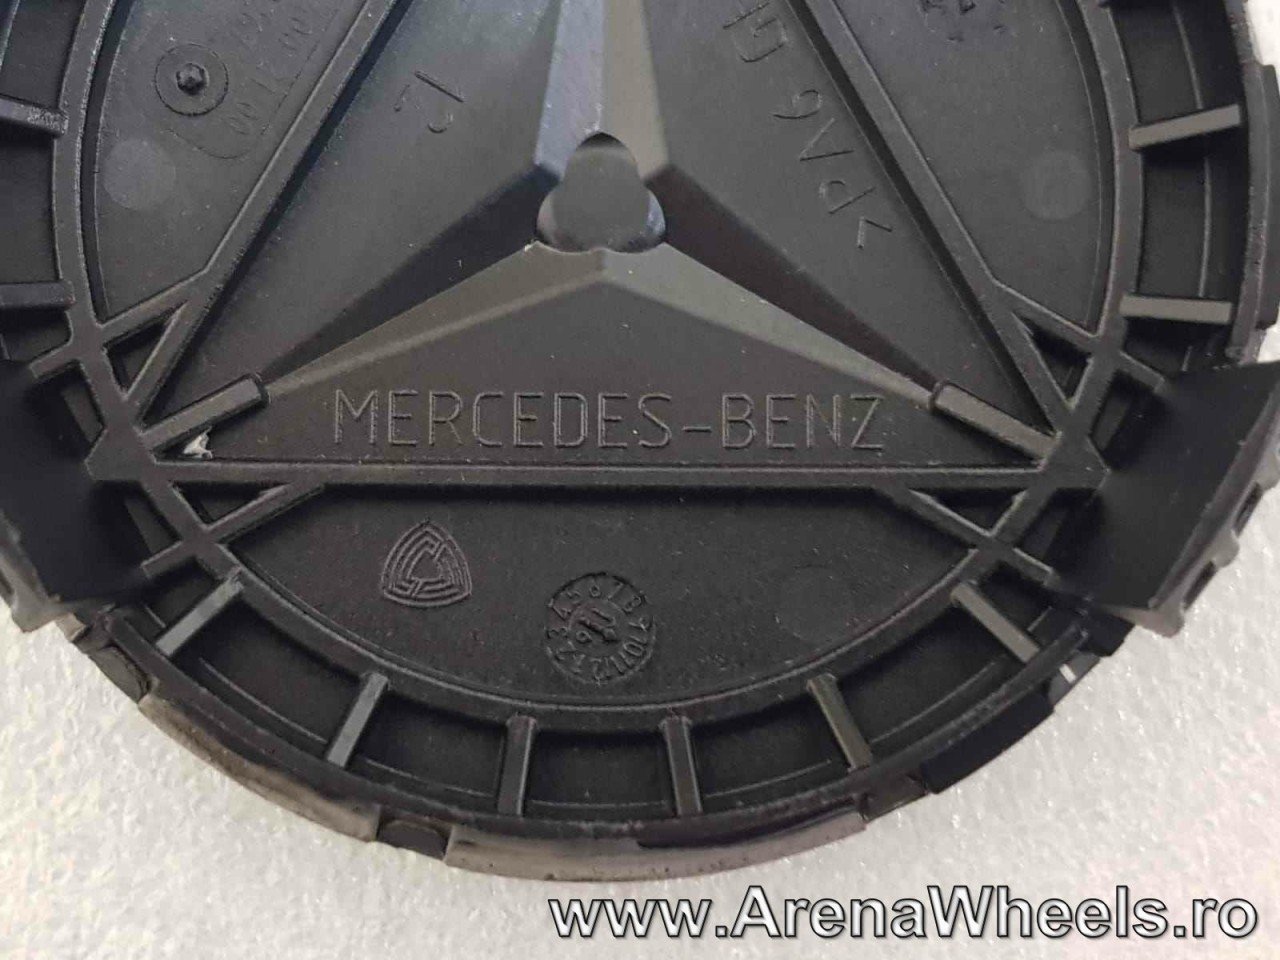 Capace Jante Mercedes A B C E S CLA CLC CLK CLS GLA GLC GLE GLK Class AMG GT T-Modell Coupe Cabrio